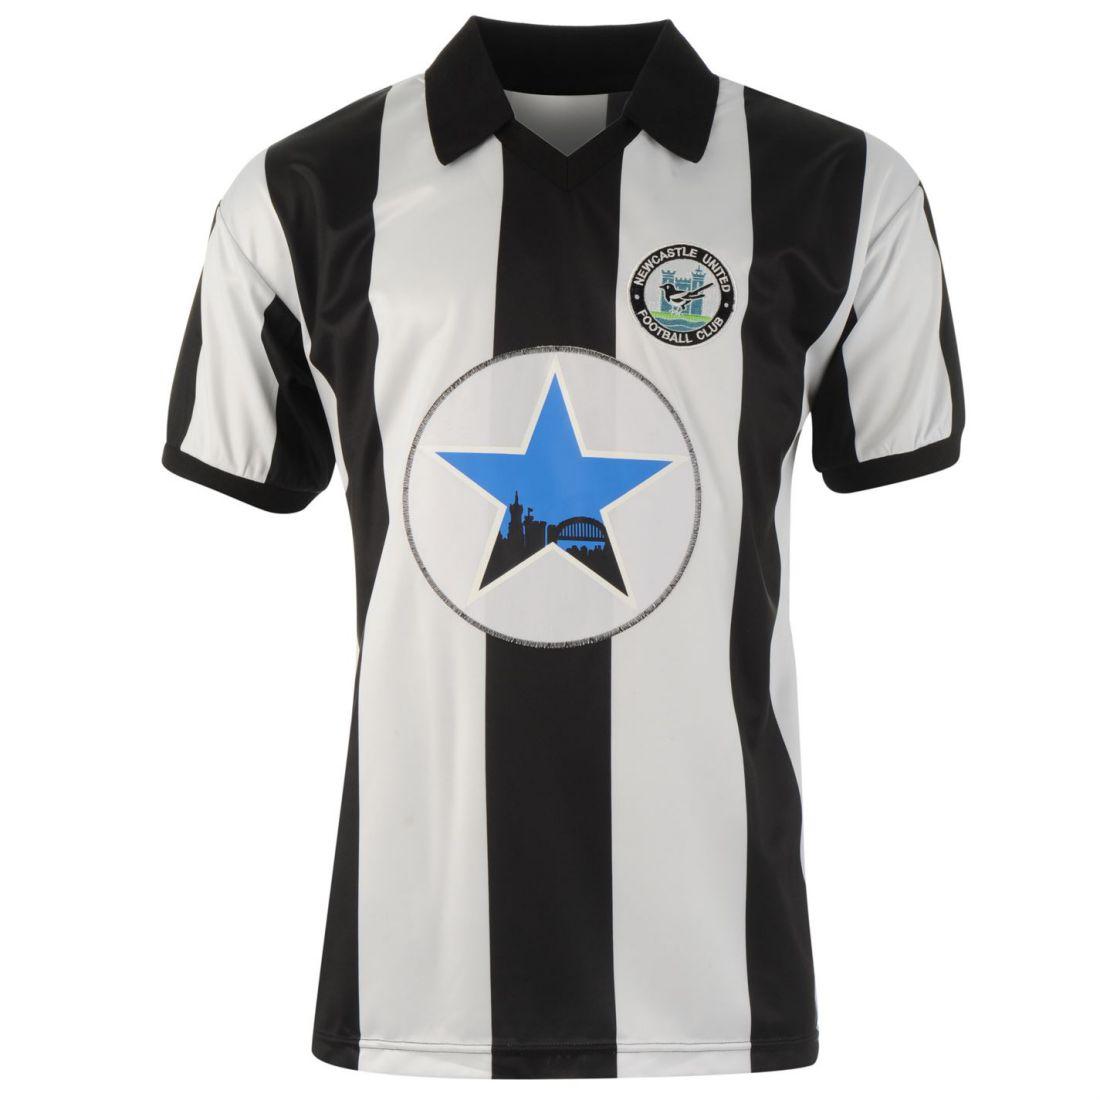 Score Draw Newcastle United Football Club 1982 Home Jersey Mens Gents Retro